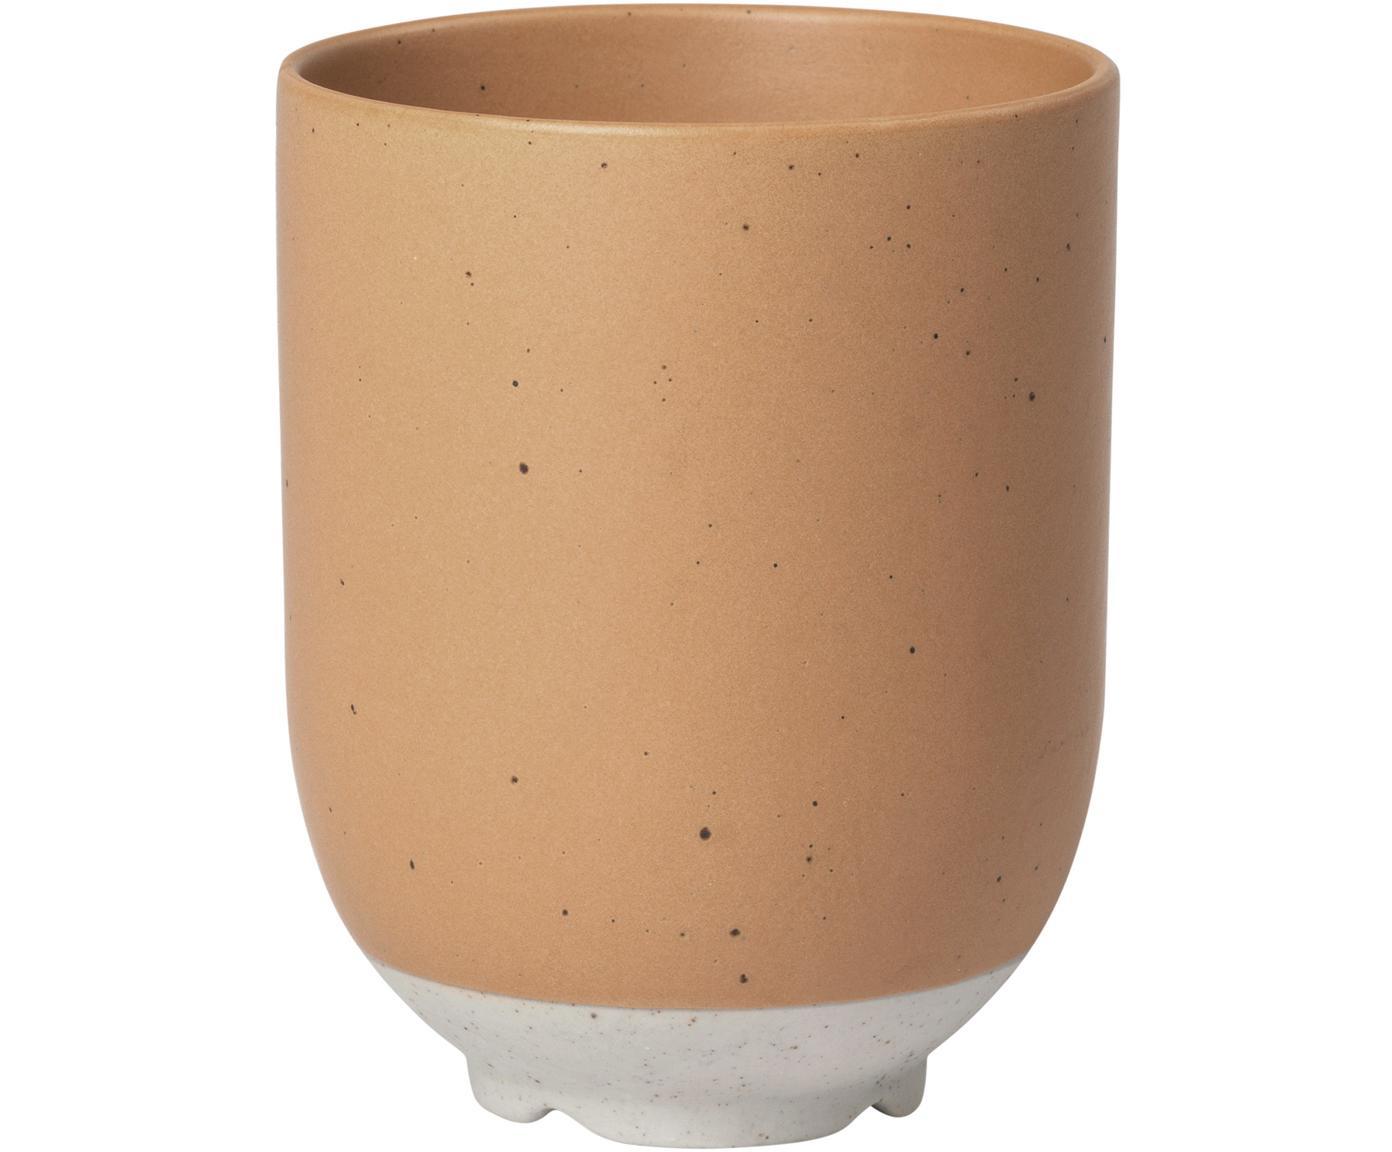 Tazza senza manico in terracotta opaca Eli 4 pz, Gres, Marrone chiaro, beige, Ø 7 x Alt. 9 cm